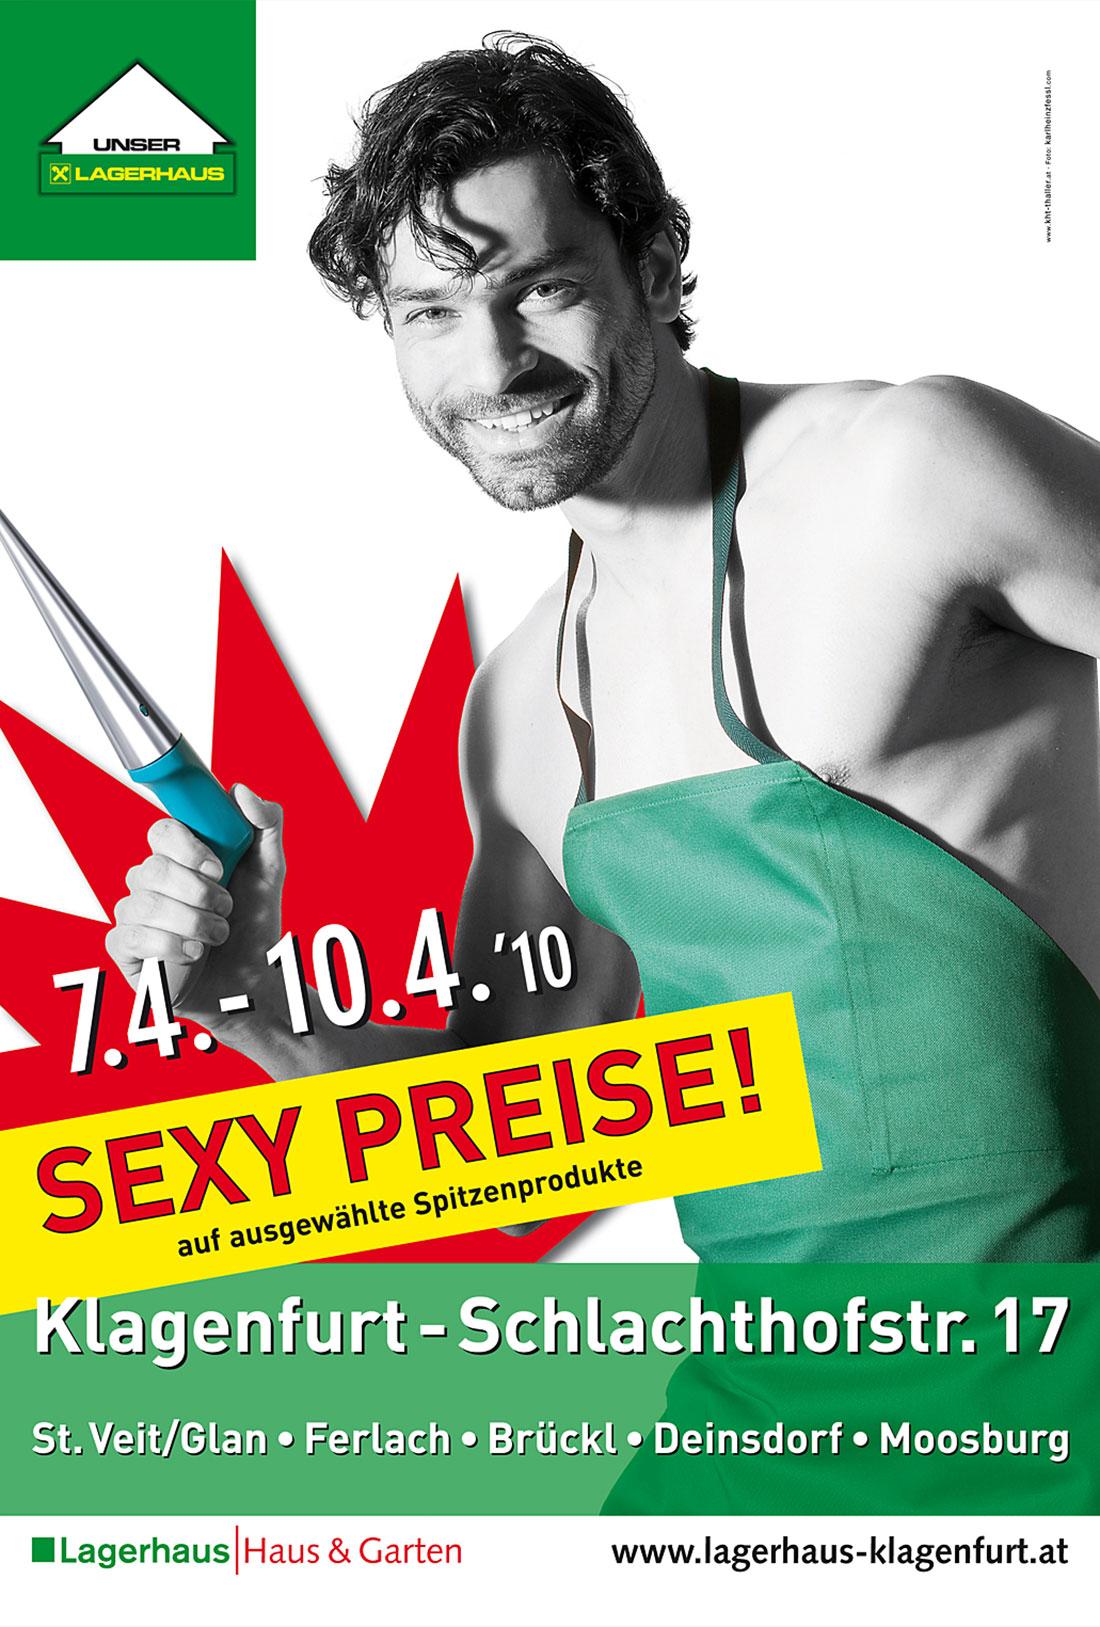 Plakat-Design Lagerhaus